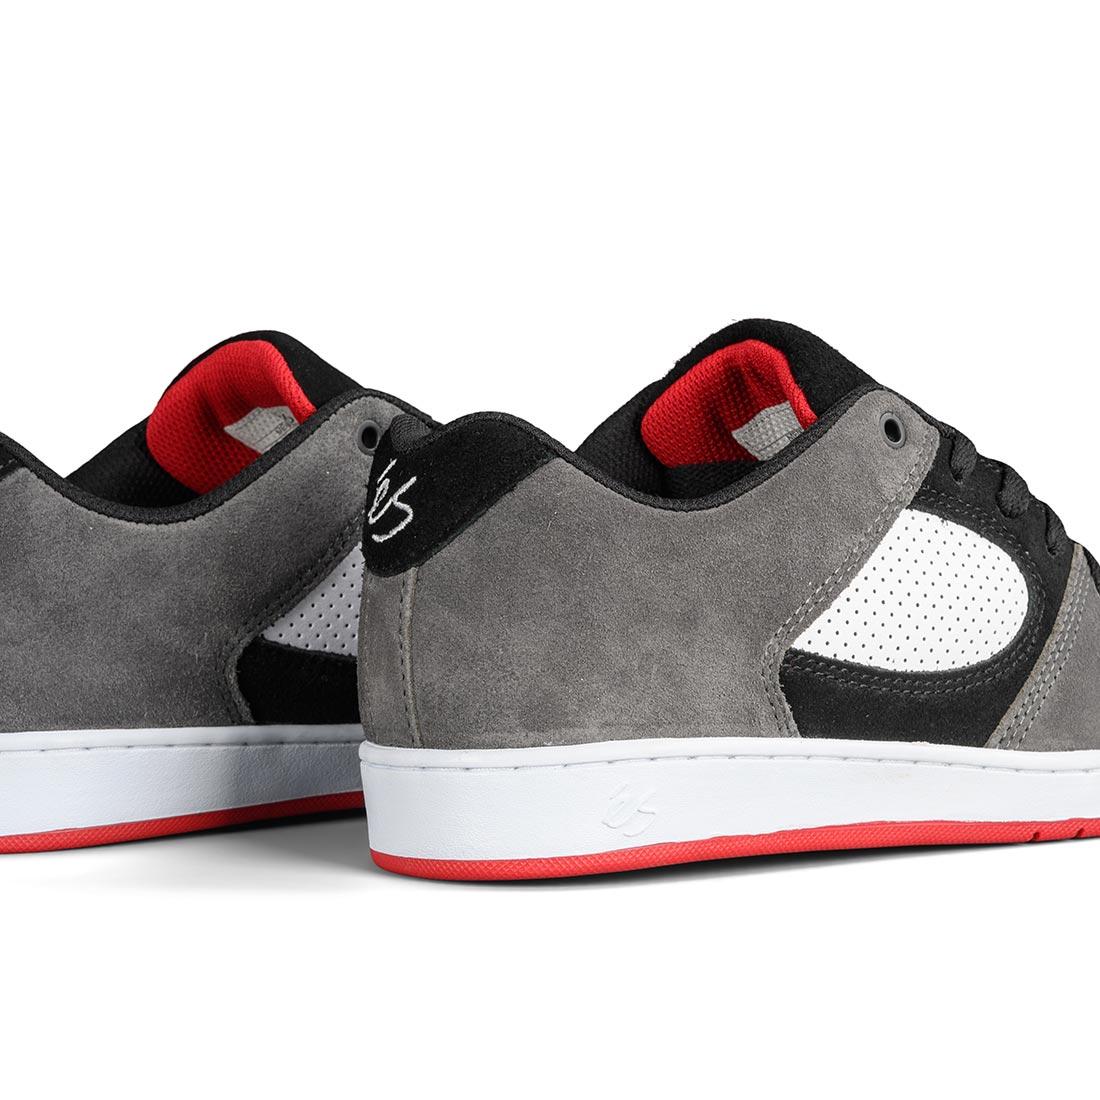 eS Accel Slim Shoes - Grey / White